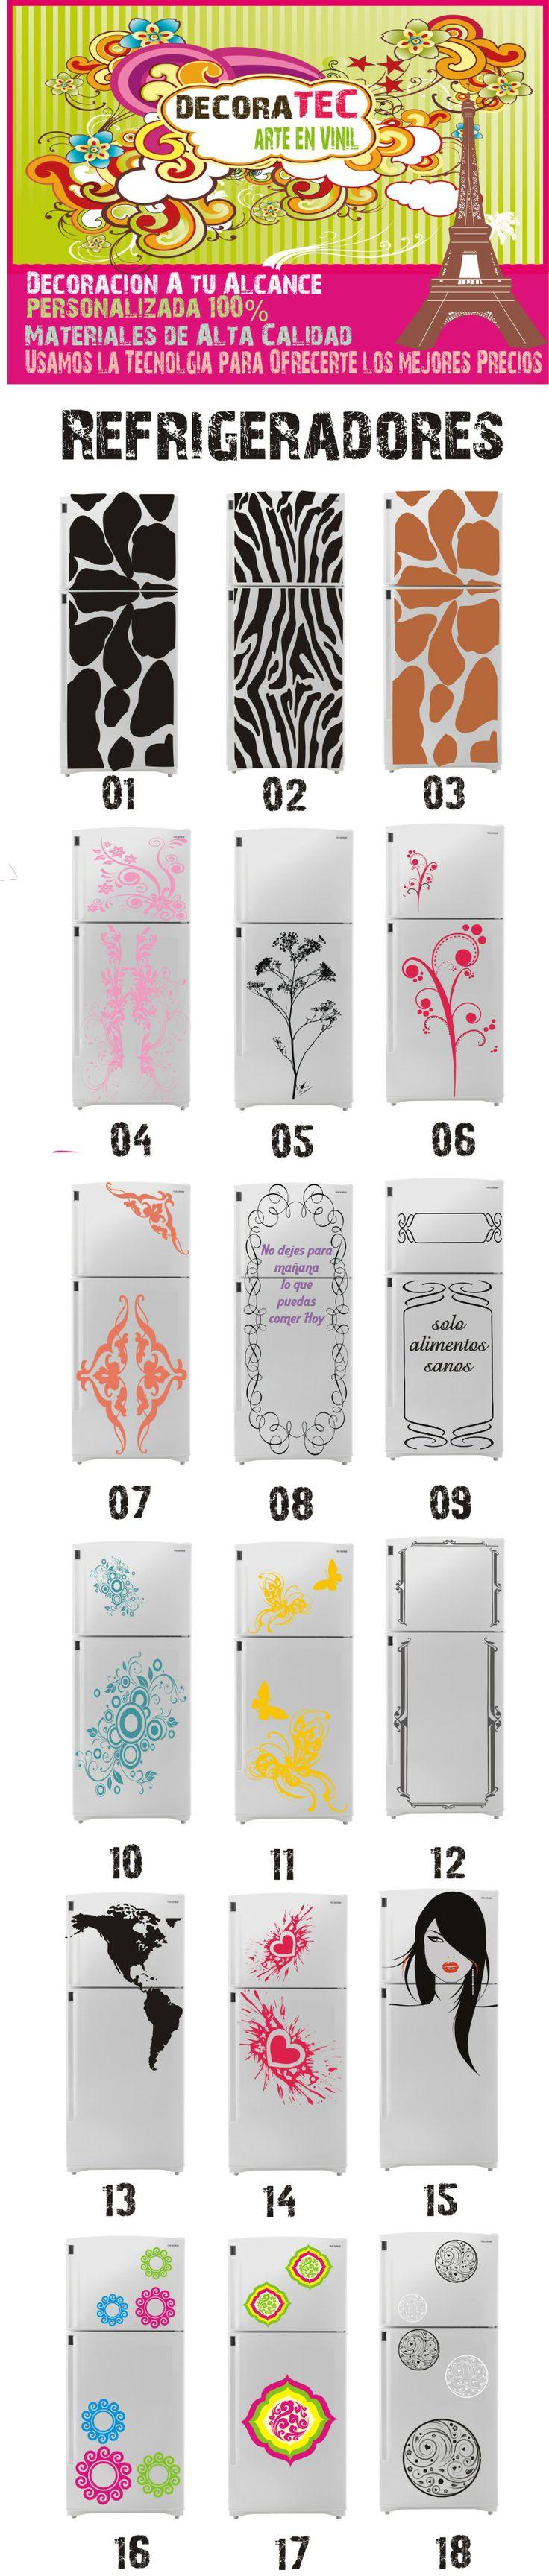 Skin y vinilos para decorar tu refrigerador, heladera, frigobar http://www.pinterest.com/midalas/